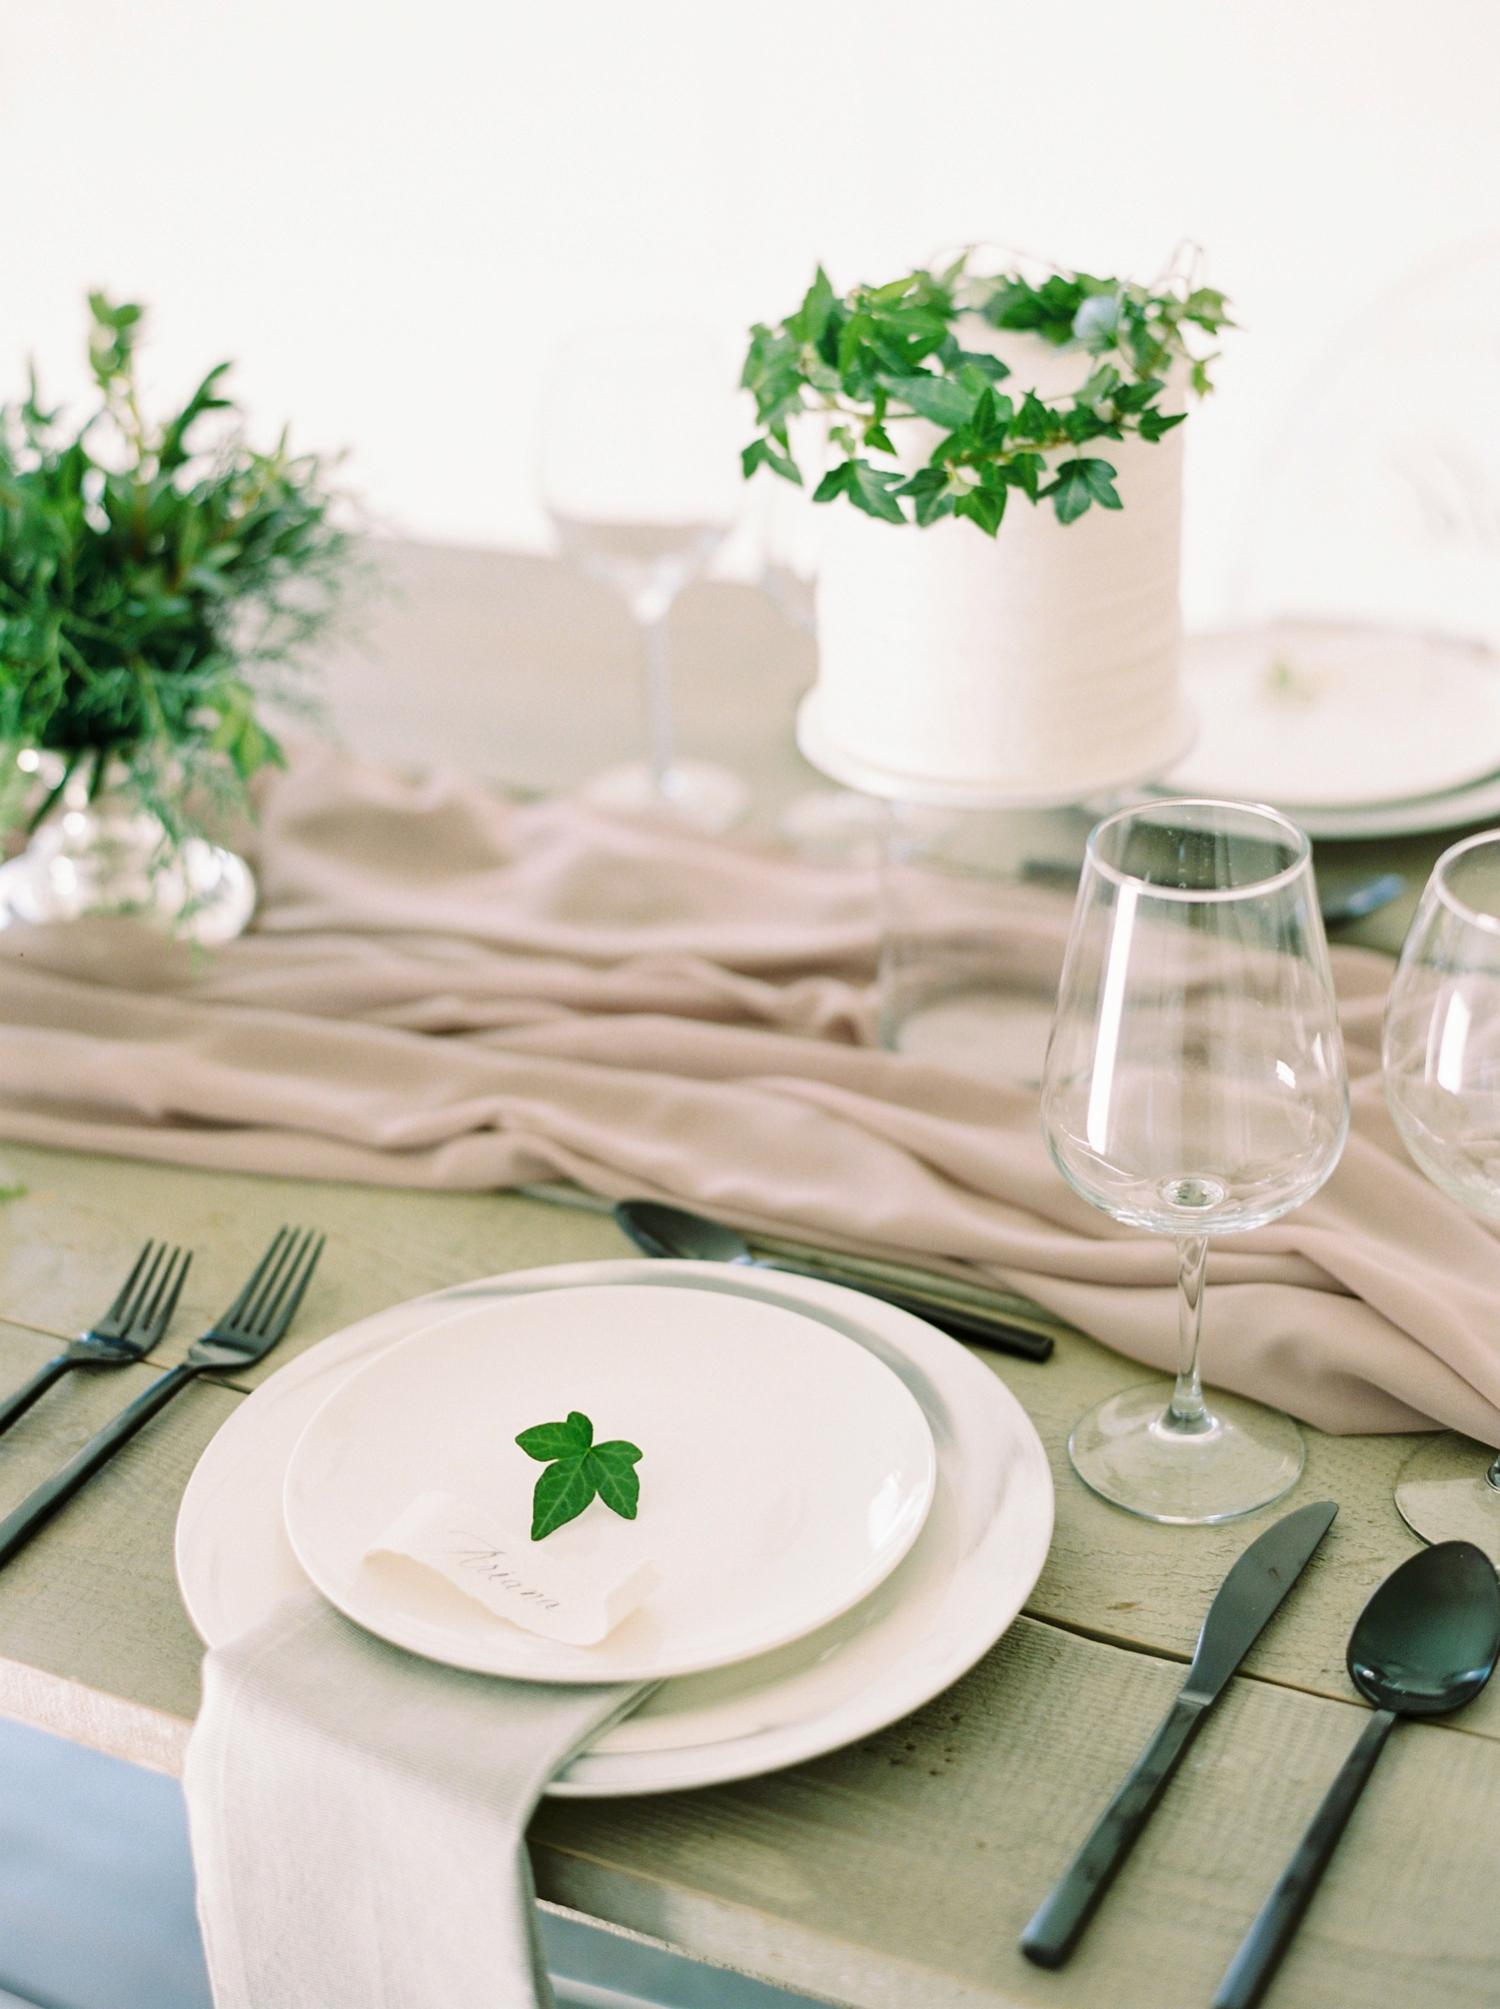 Calgary wedding photographers | fine art film | Justine Milton Photography | wedding details | editorial | wedding inspiration | wedding reception | wedding plates